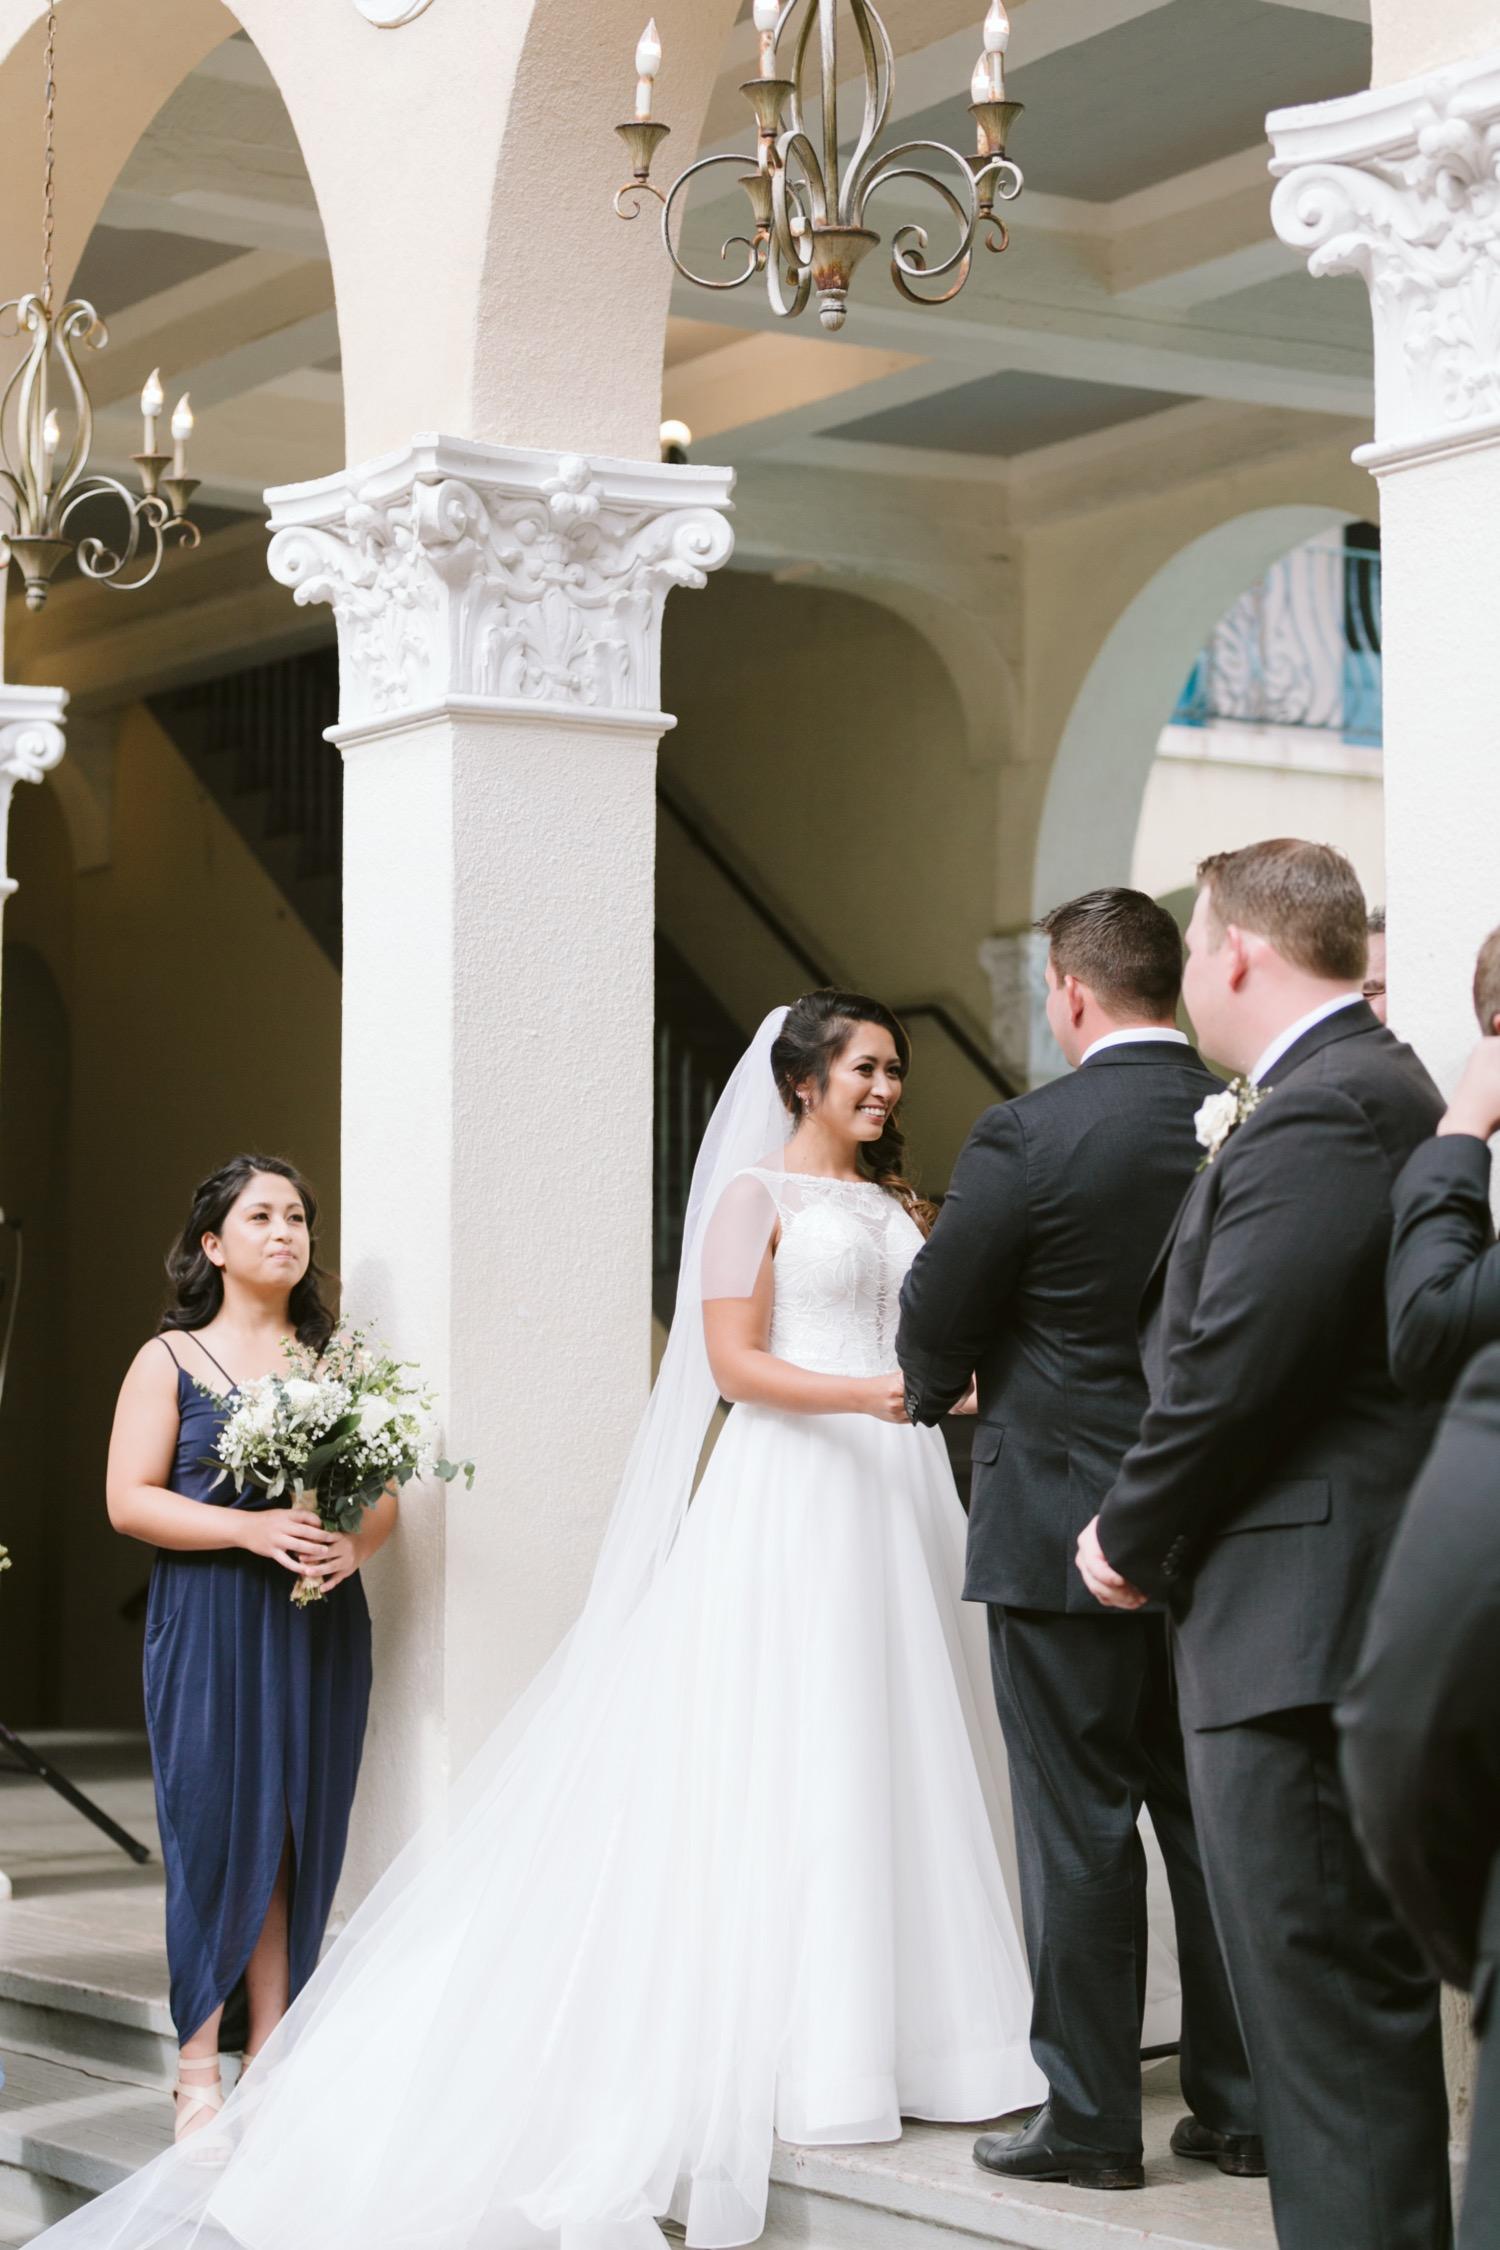 Julia_of_Honor_Groom_Ceremony_Bride_Wedding_maid_Cafe_Honolulu_Hawaii.jpg